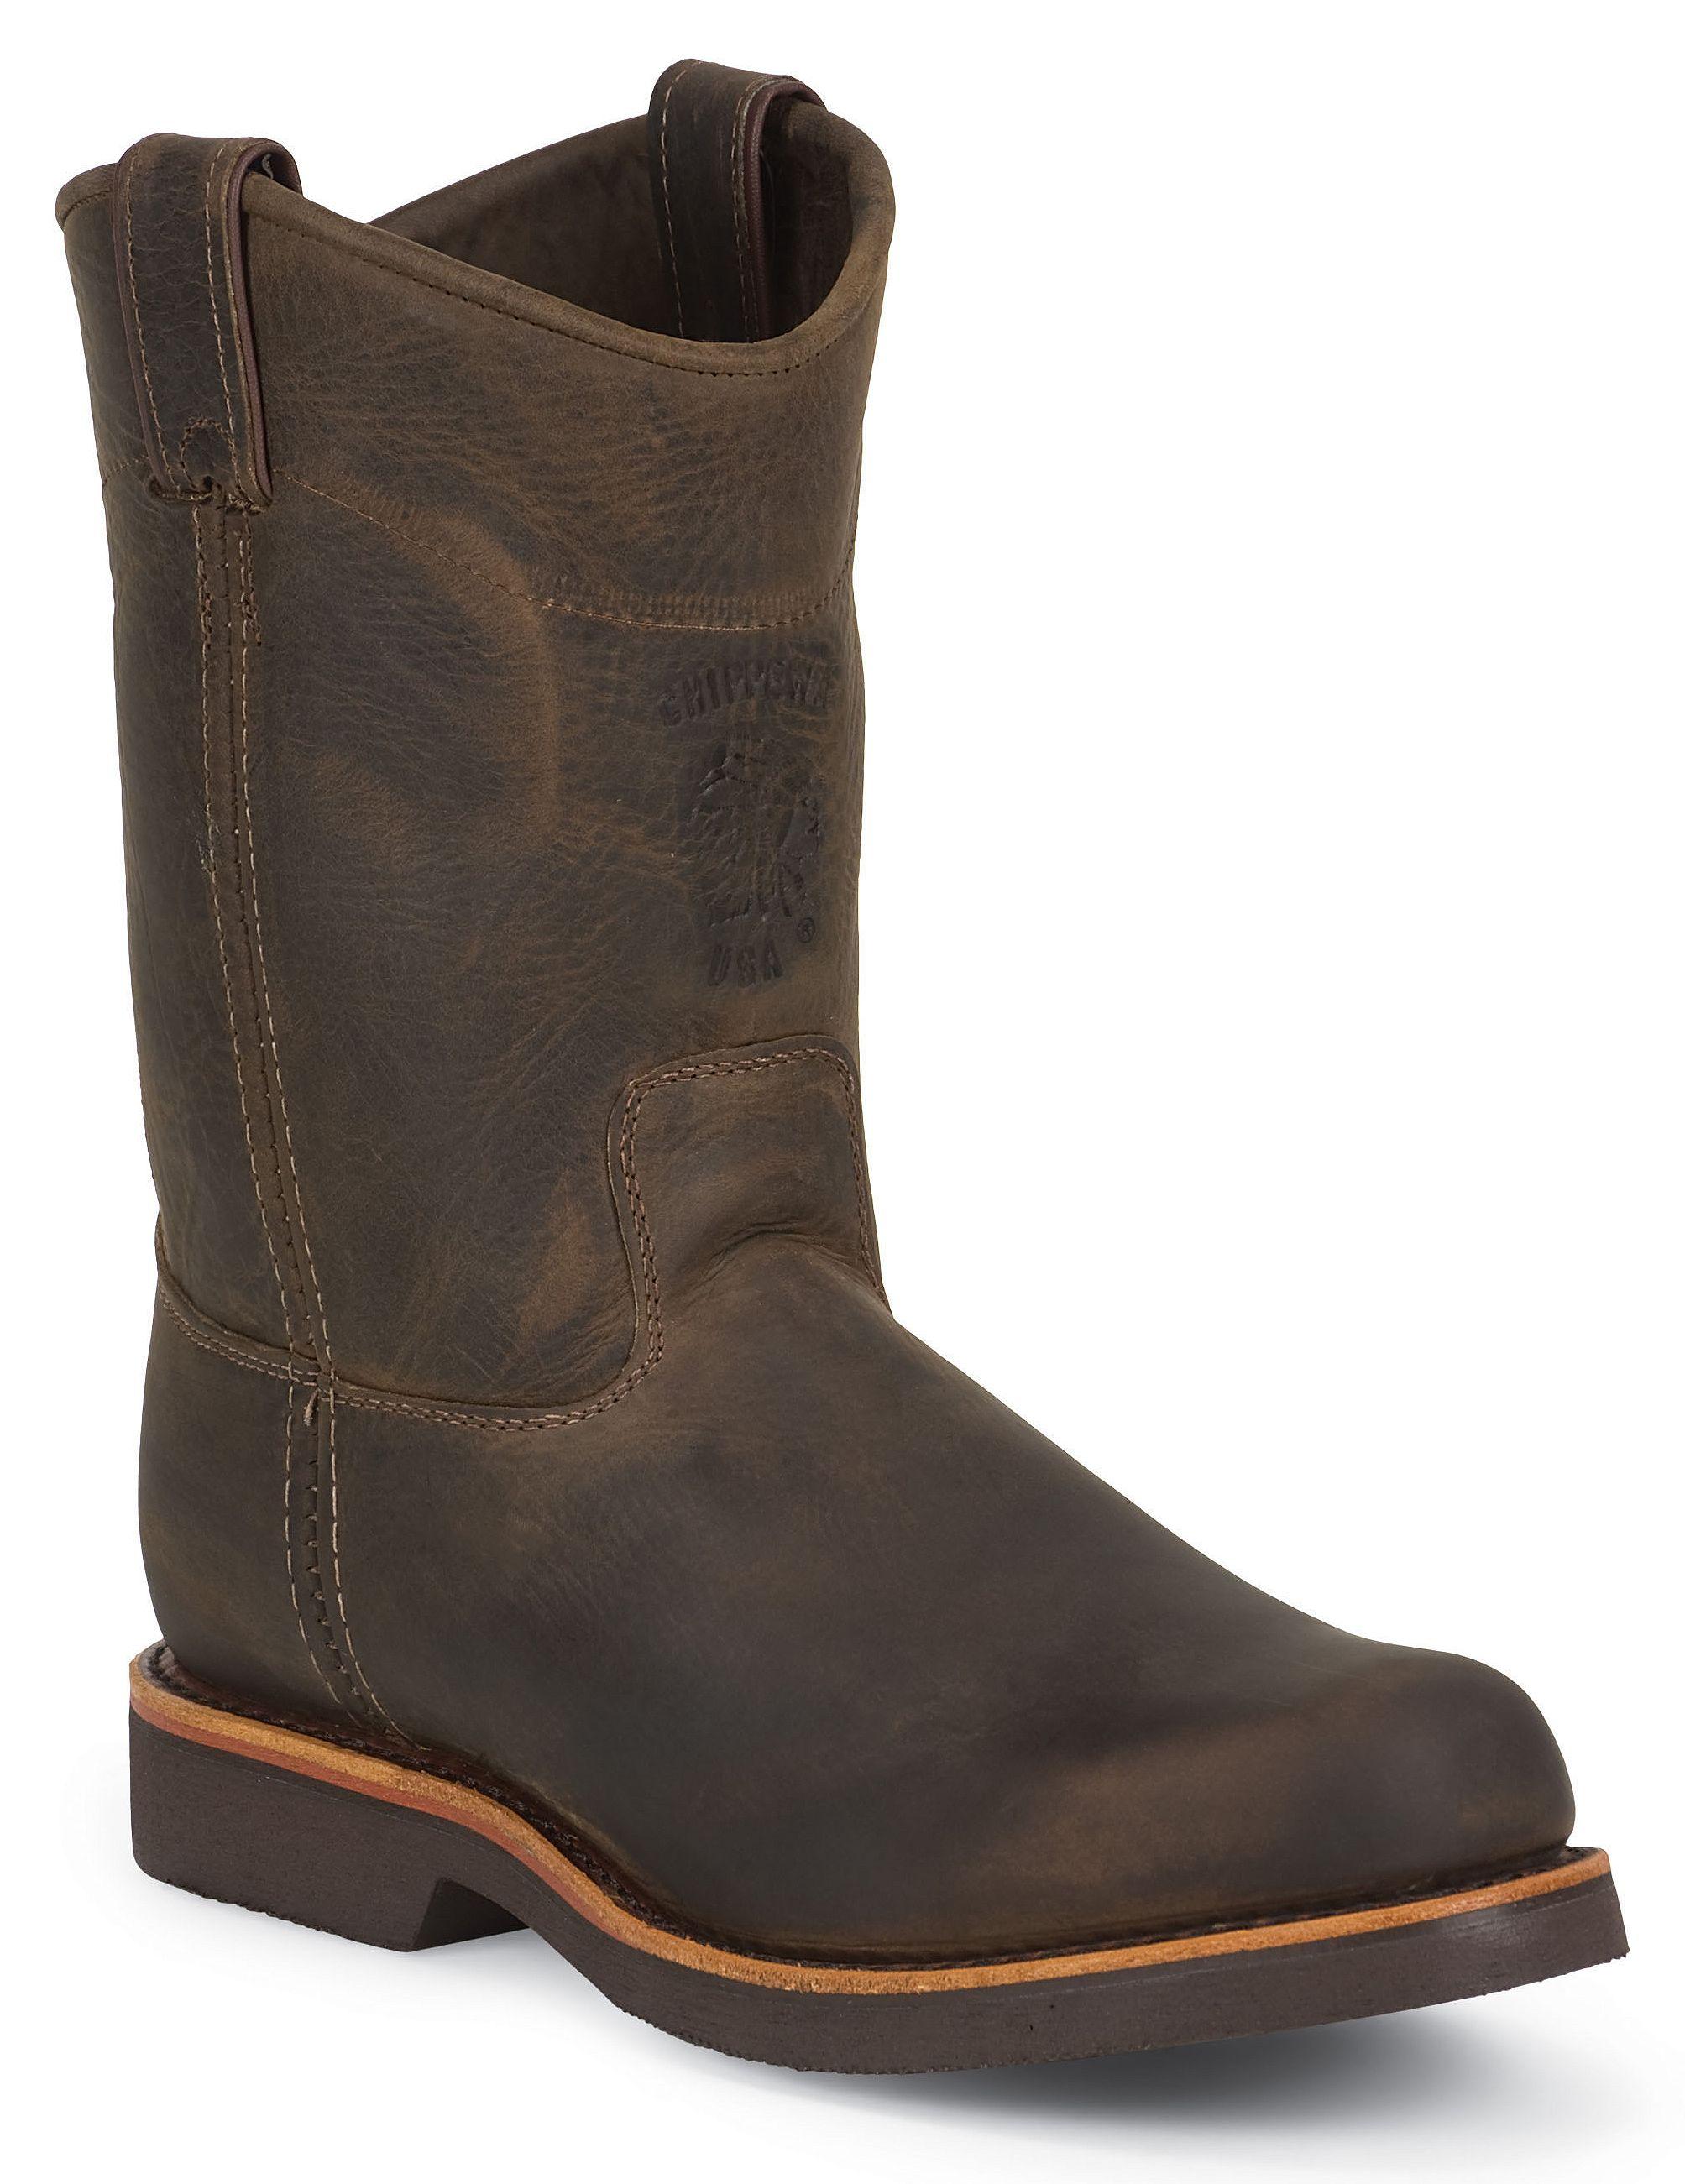 Chippewa Steel Toe Boots - Sheplers